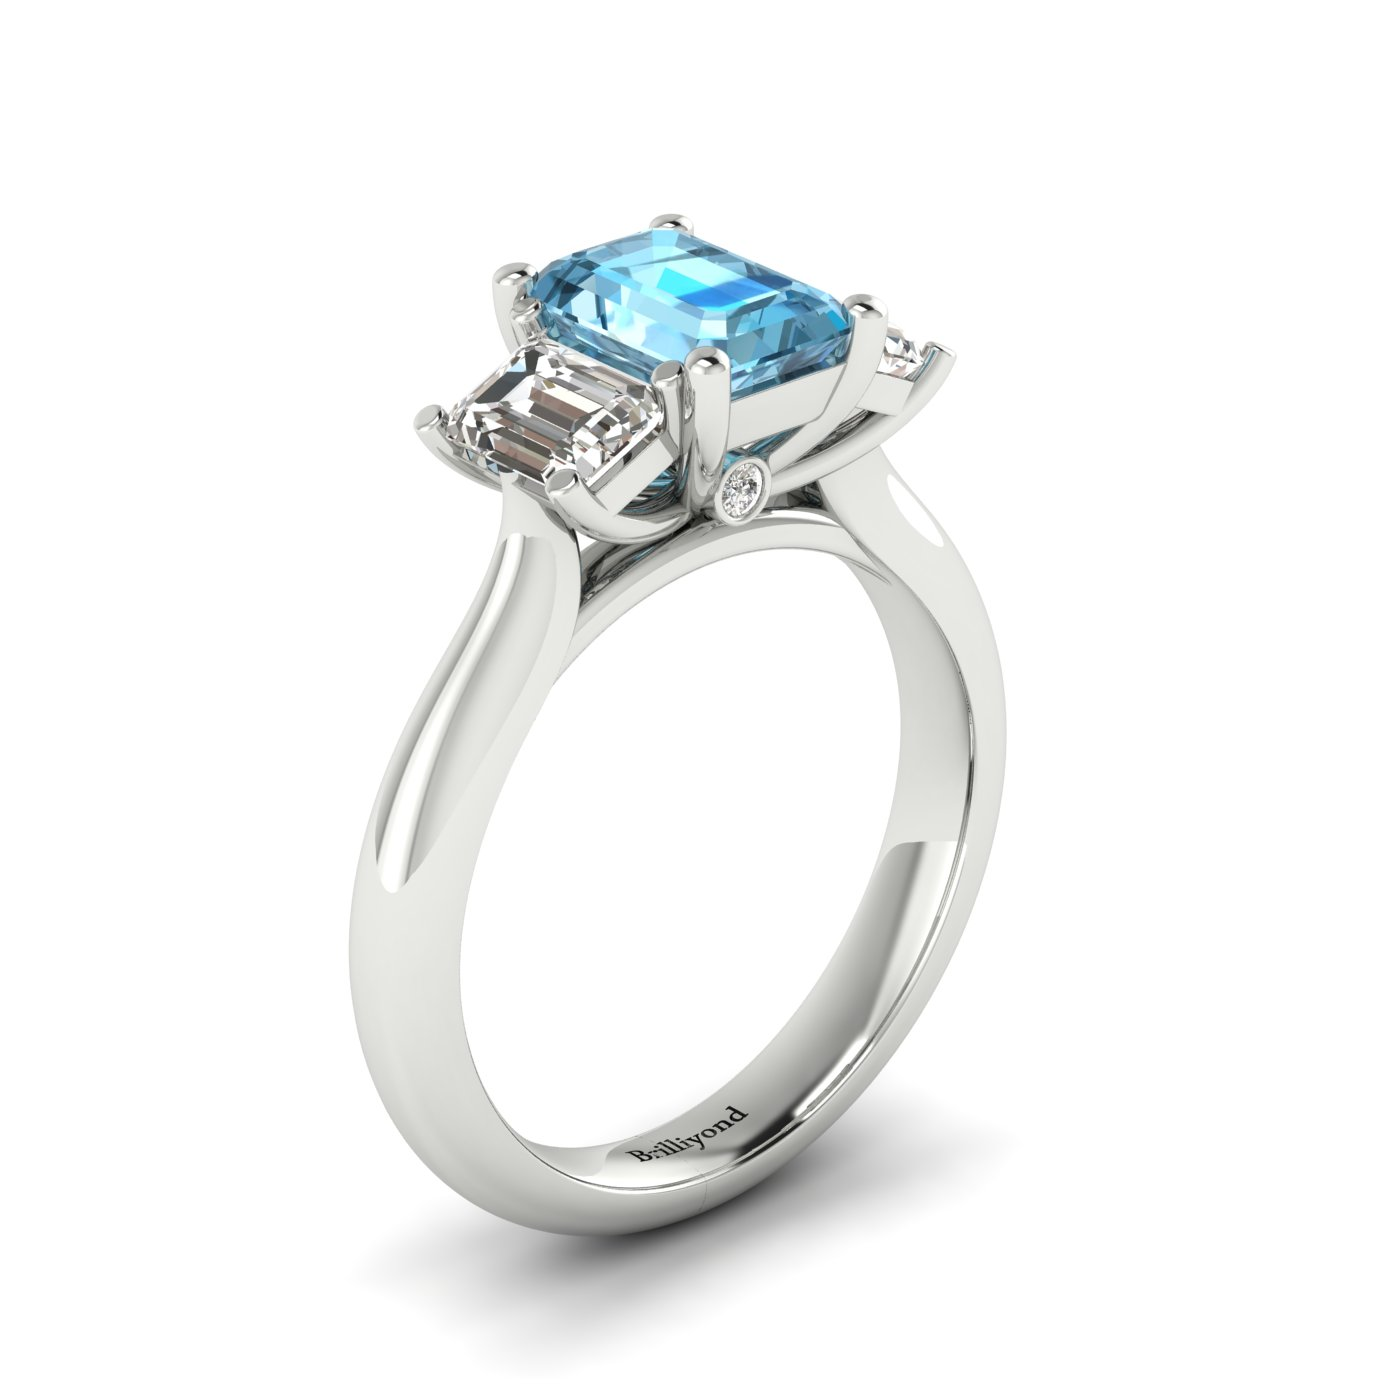 Aquamarine White Gold Emerald Cut Engagement Ring Blanche